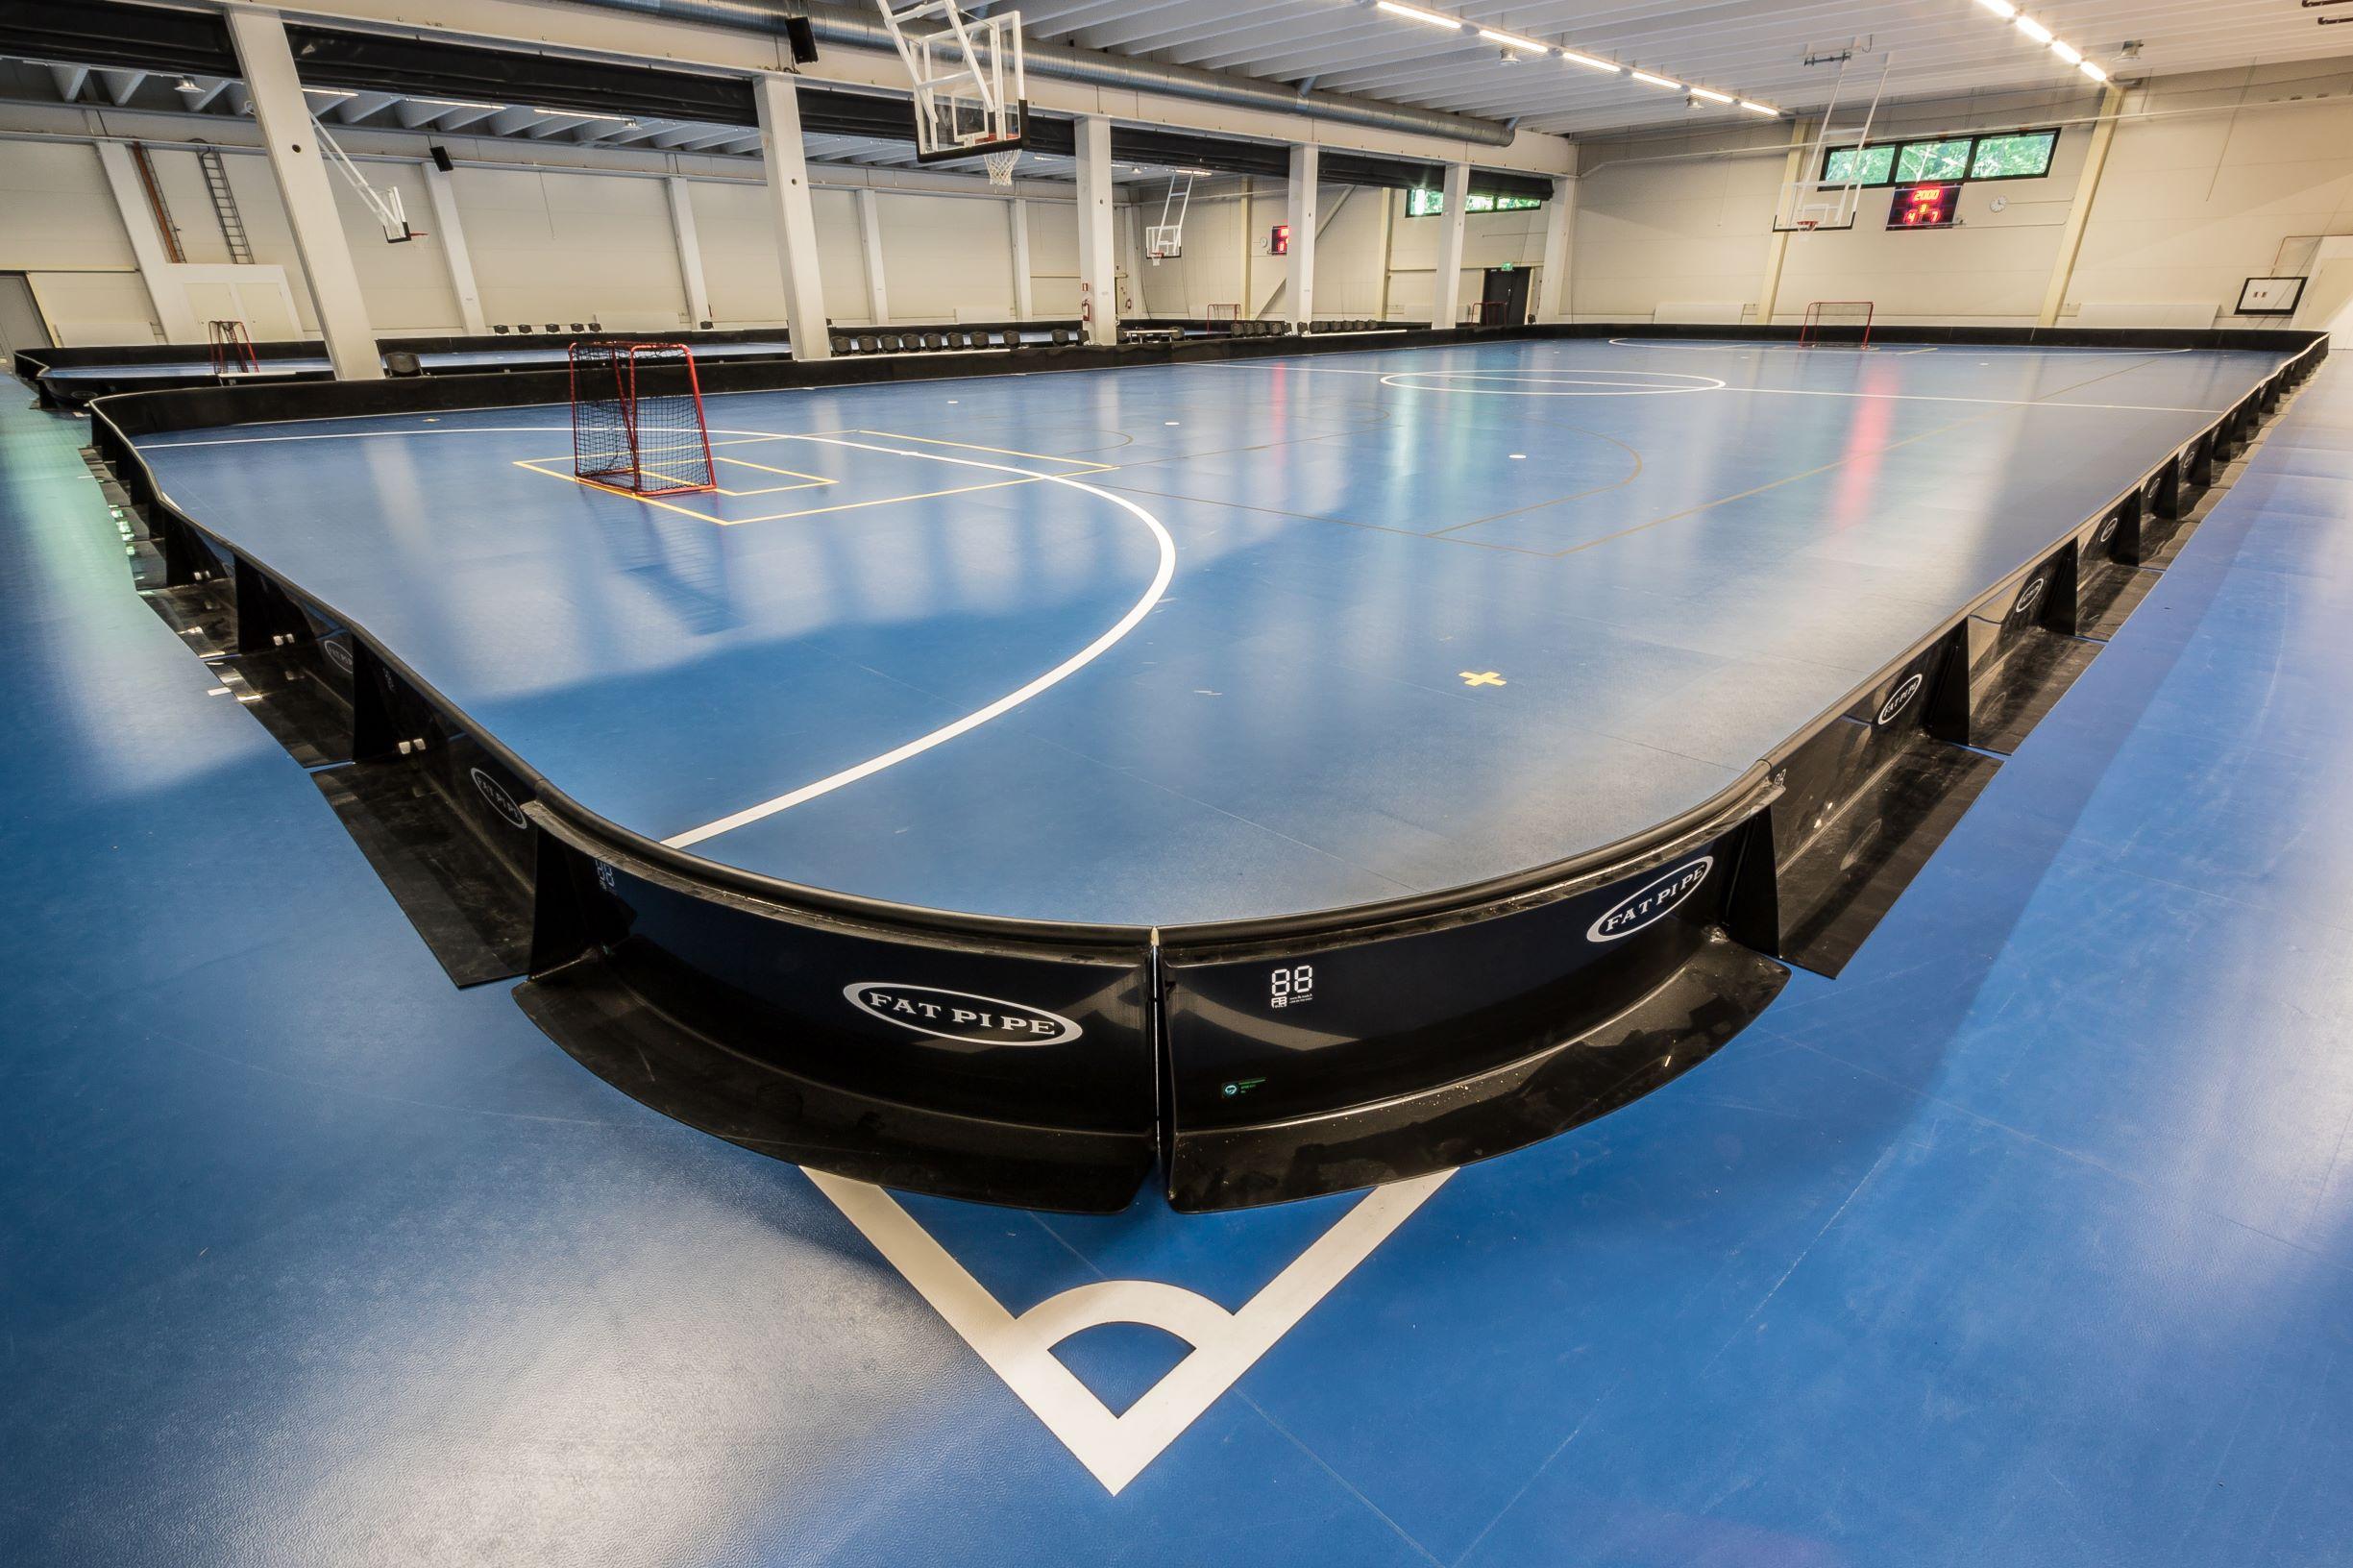 Unisport urheilulattia salibandy Kauppi Sports Center